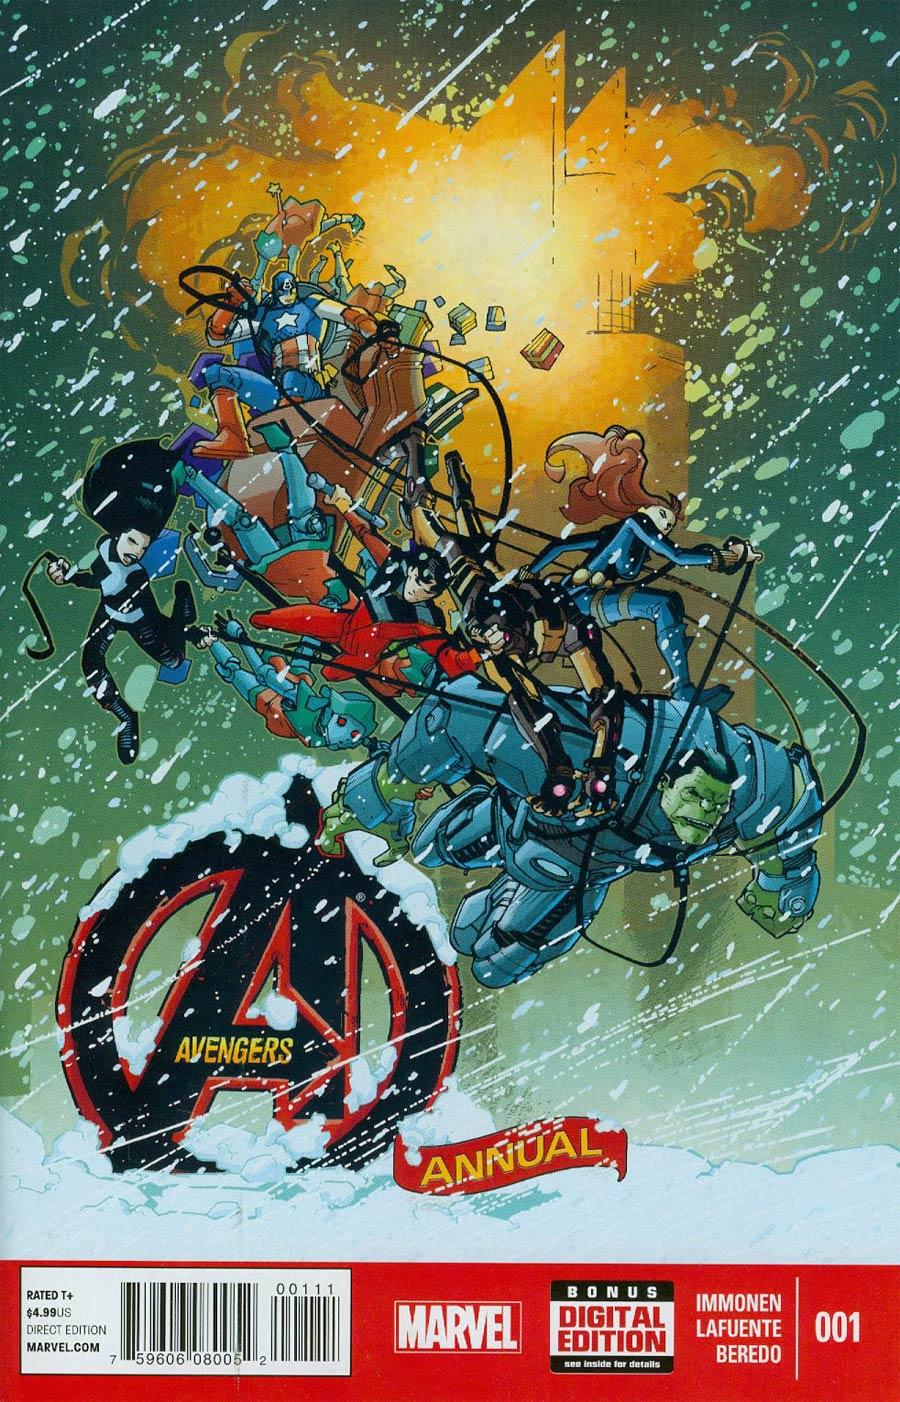 Avengers Vol 5 Annual #1